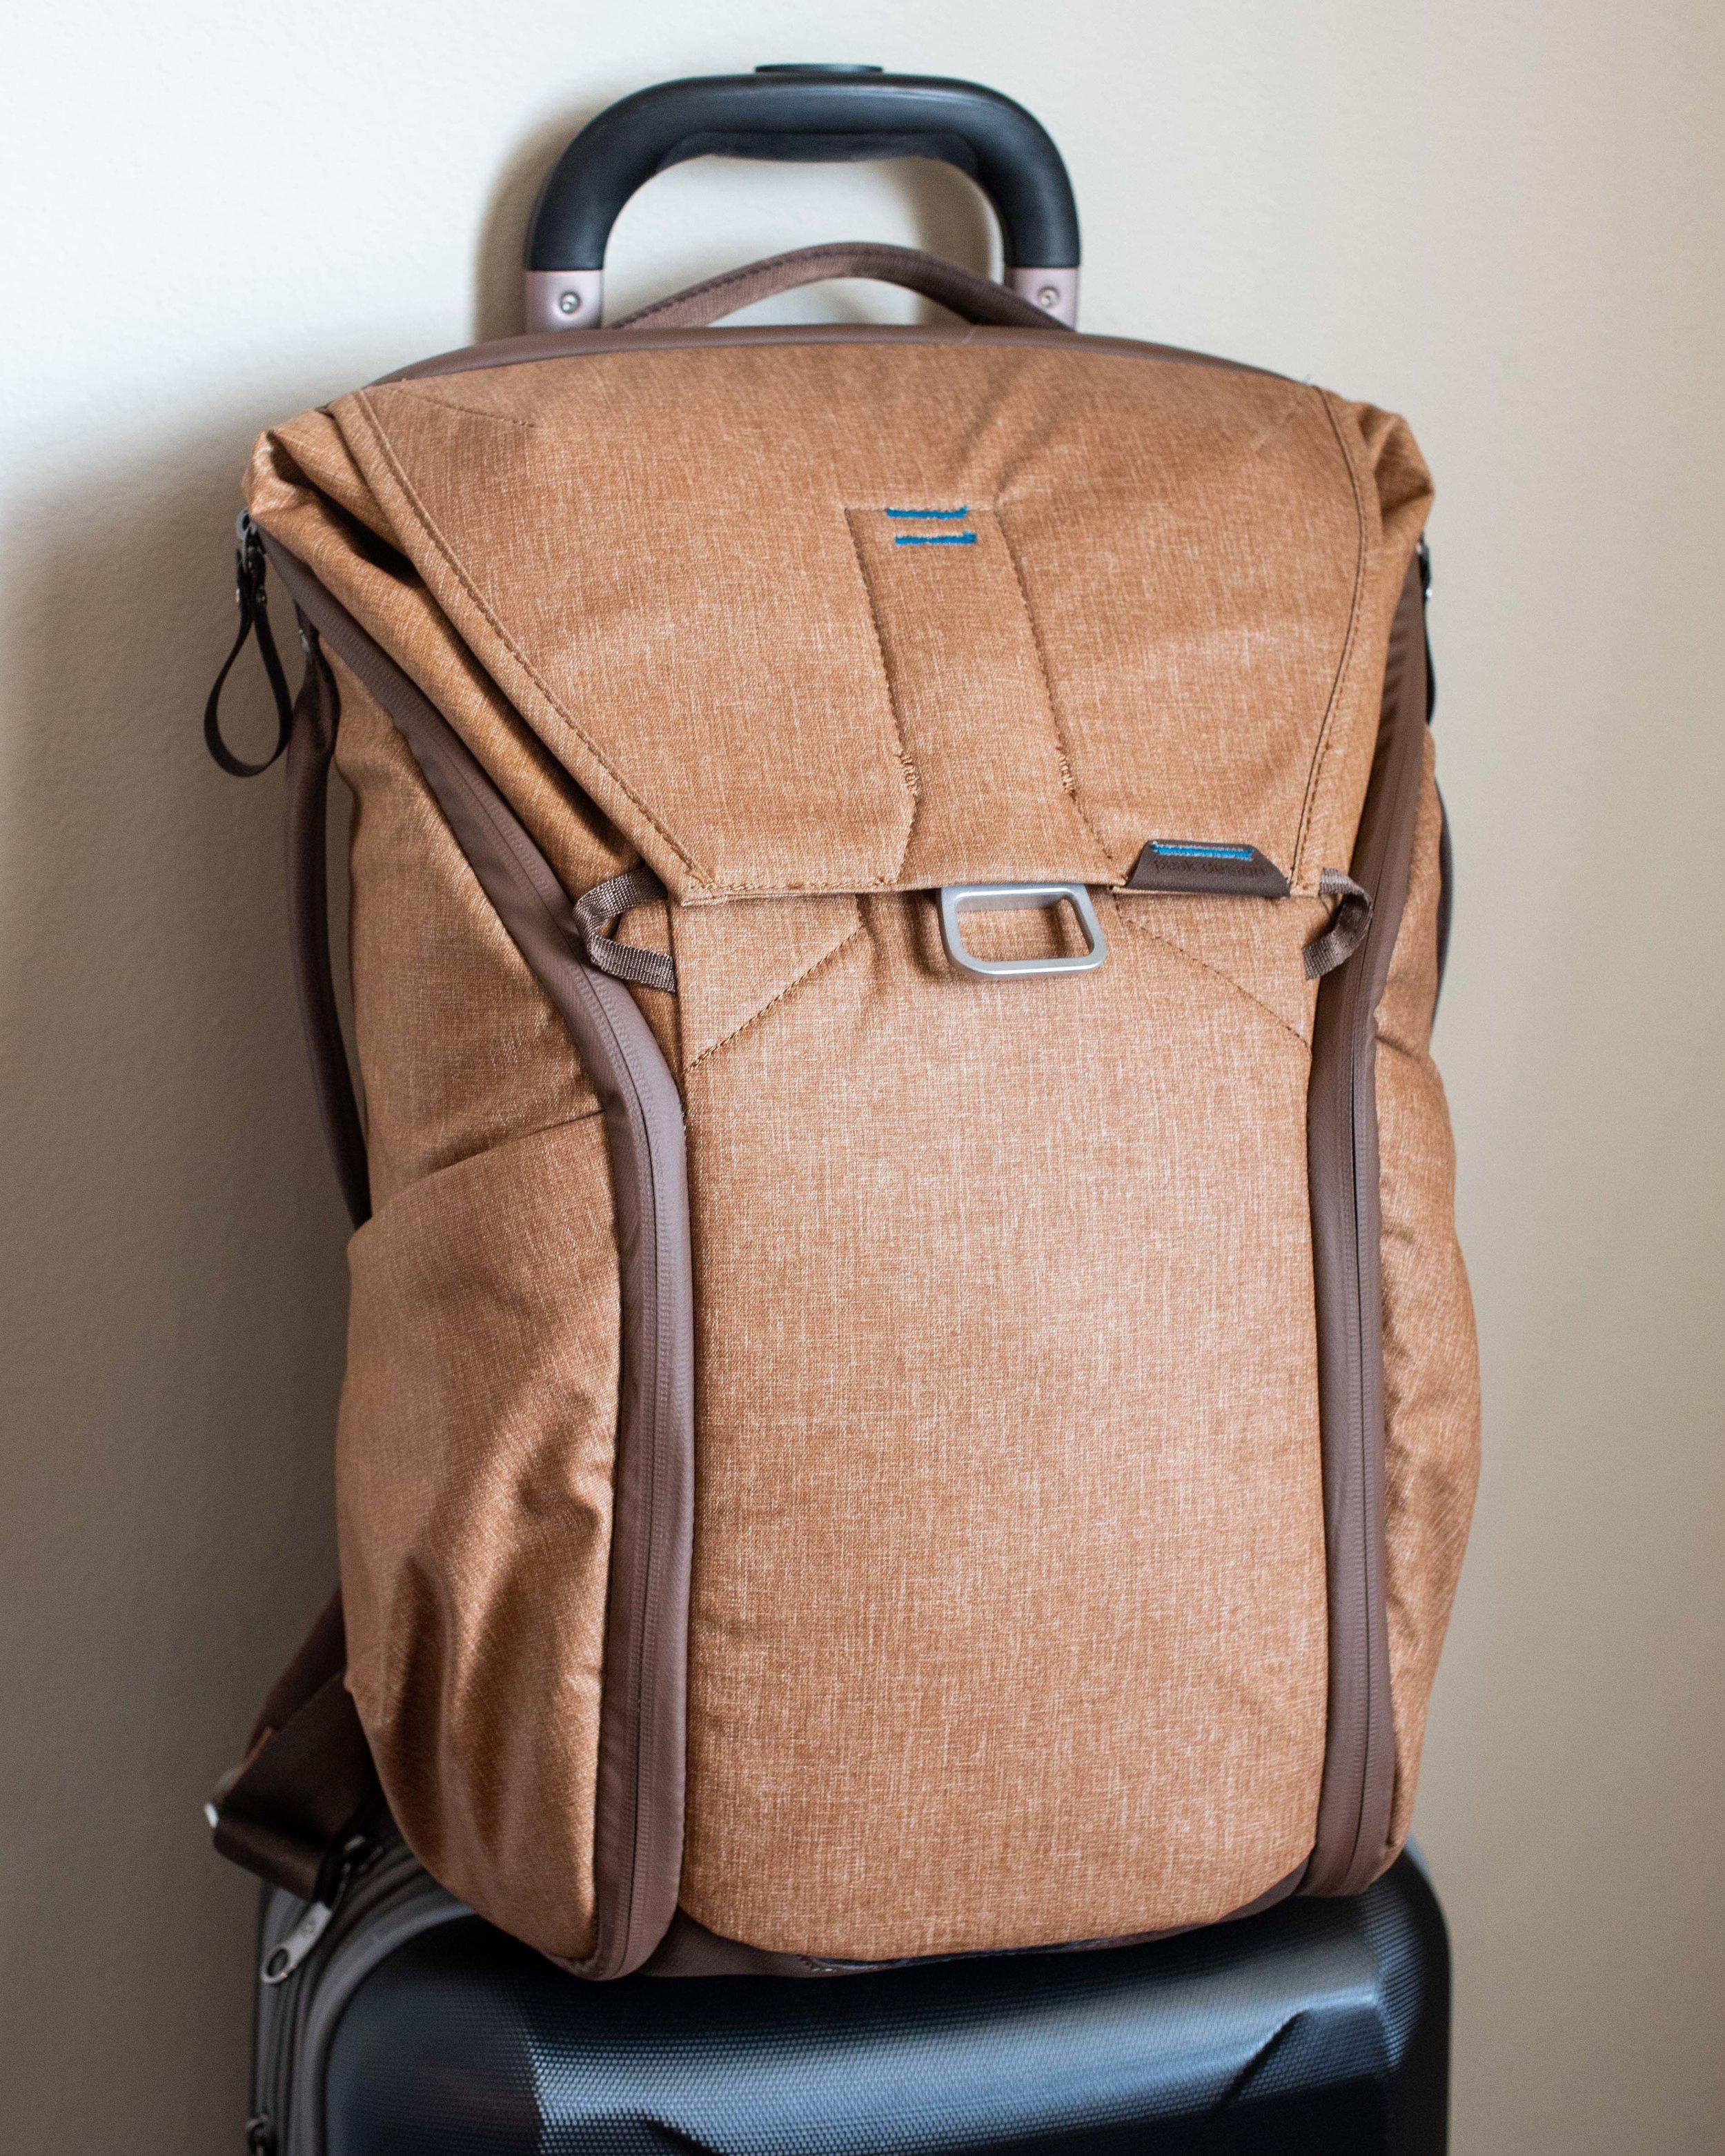 The Peak Designs 20L Everyday Backpack.